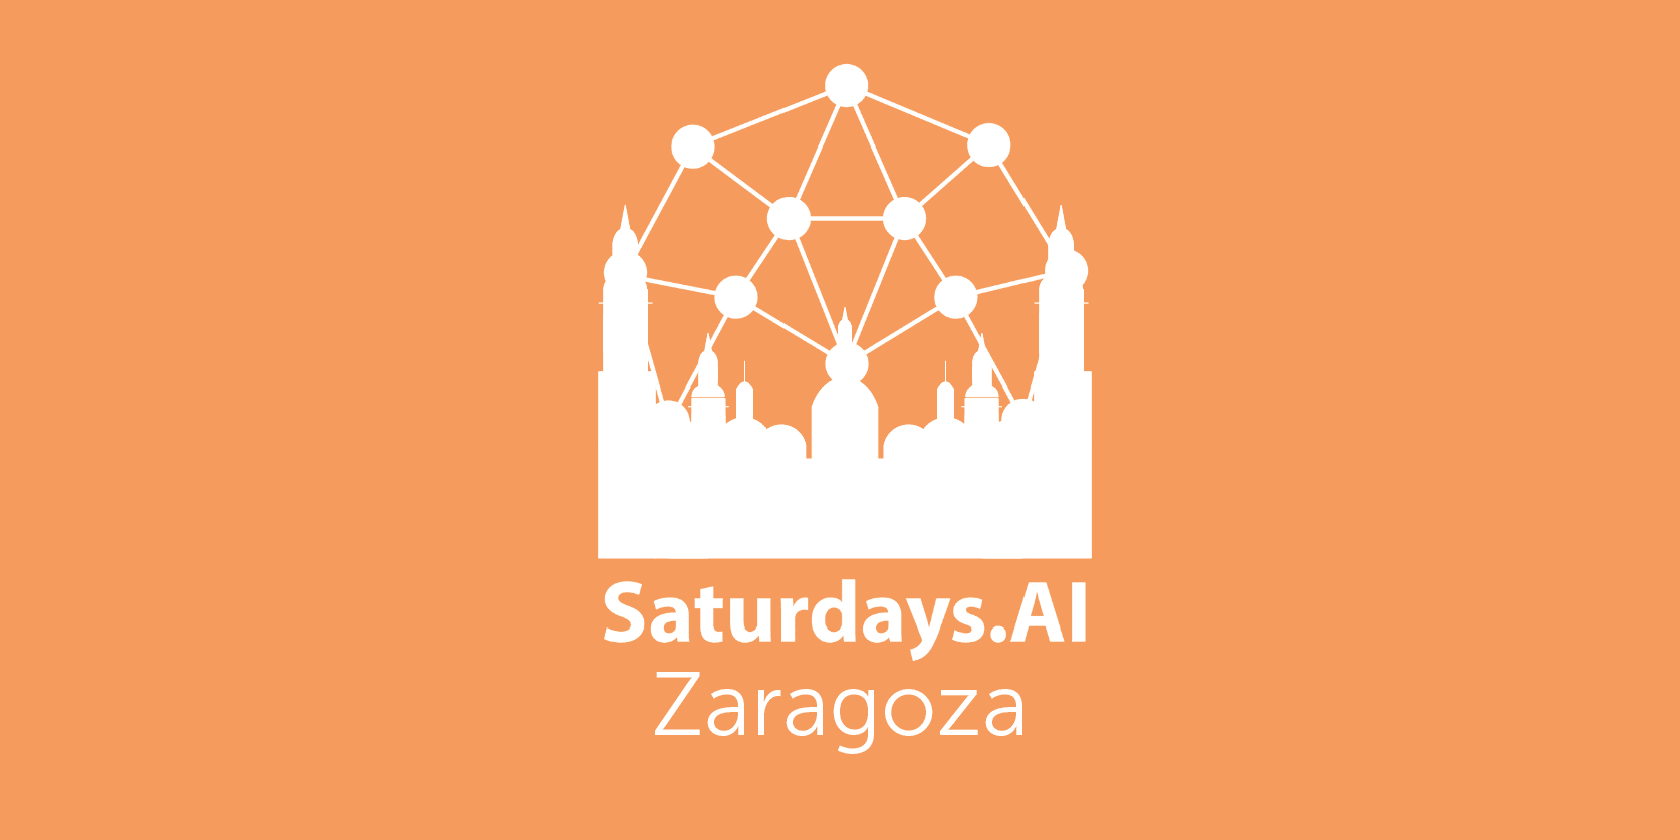 Saturdays AI Zaragoza